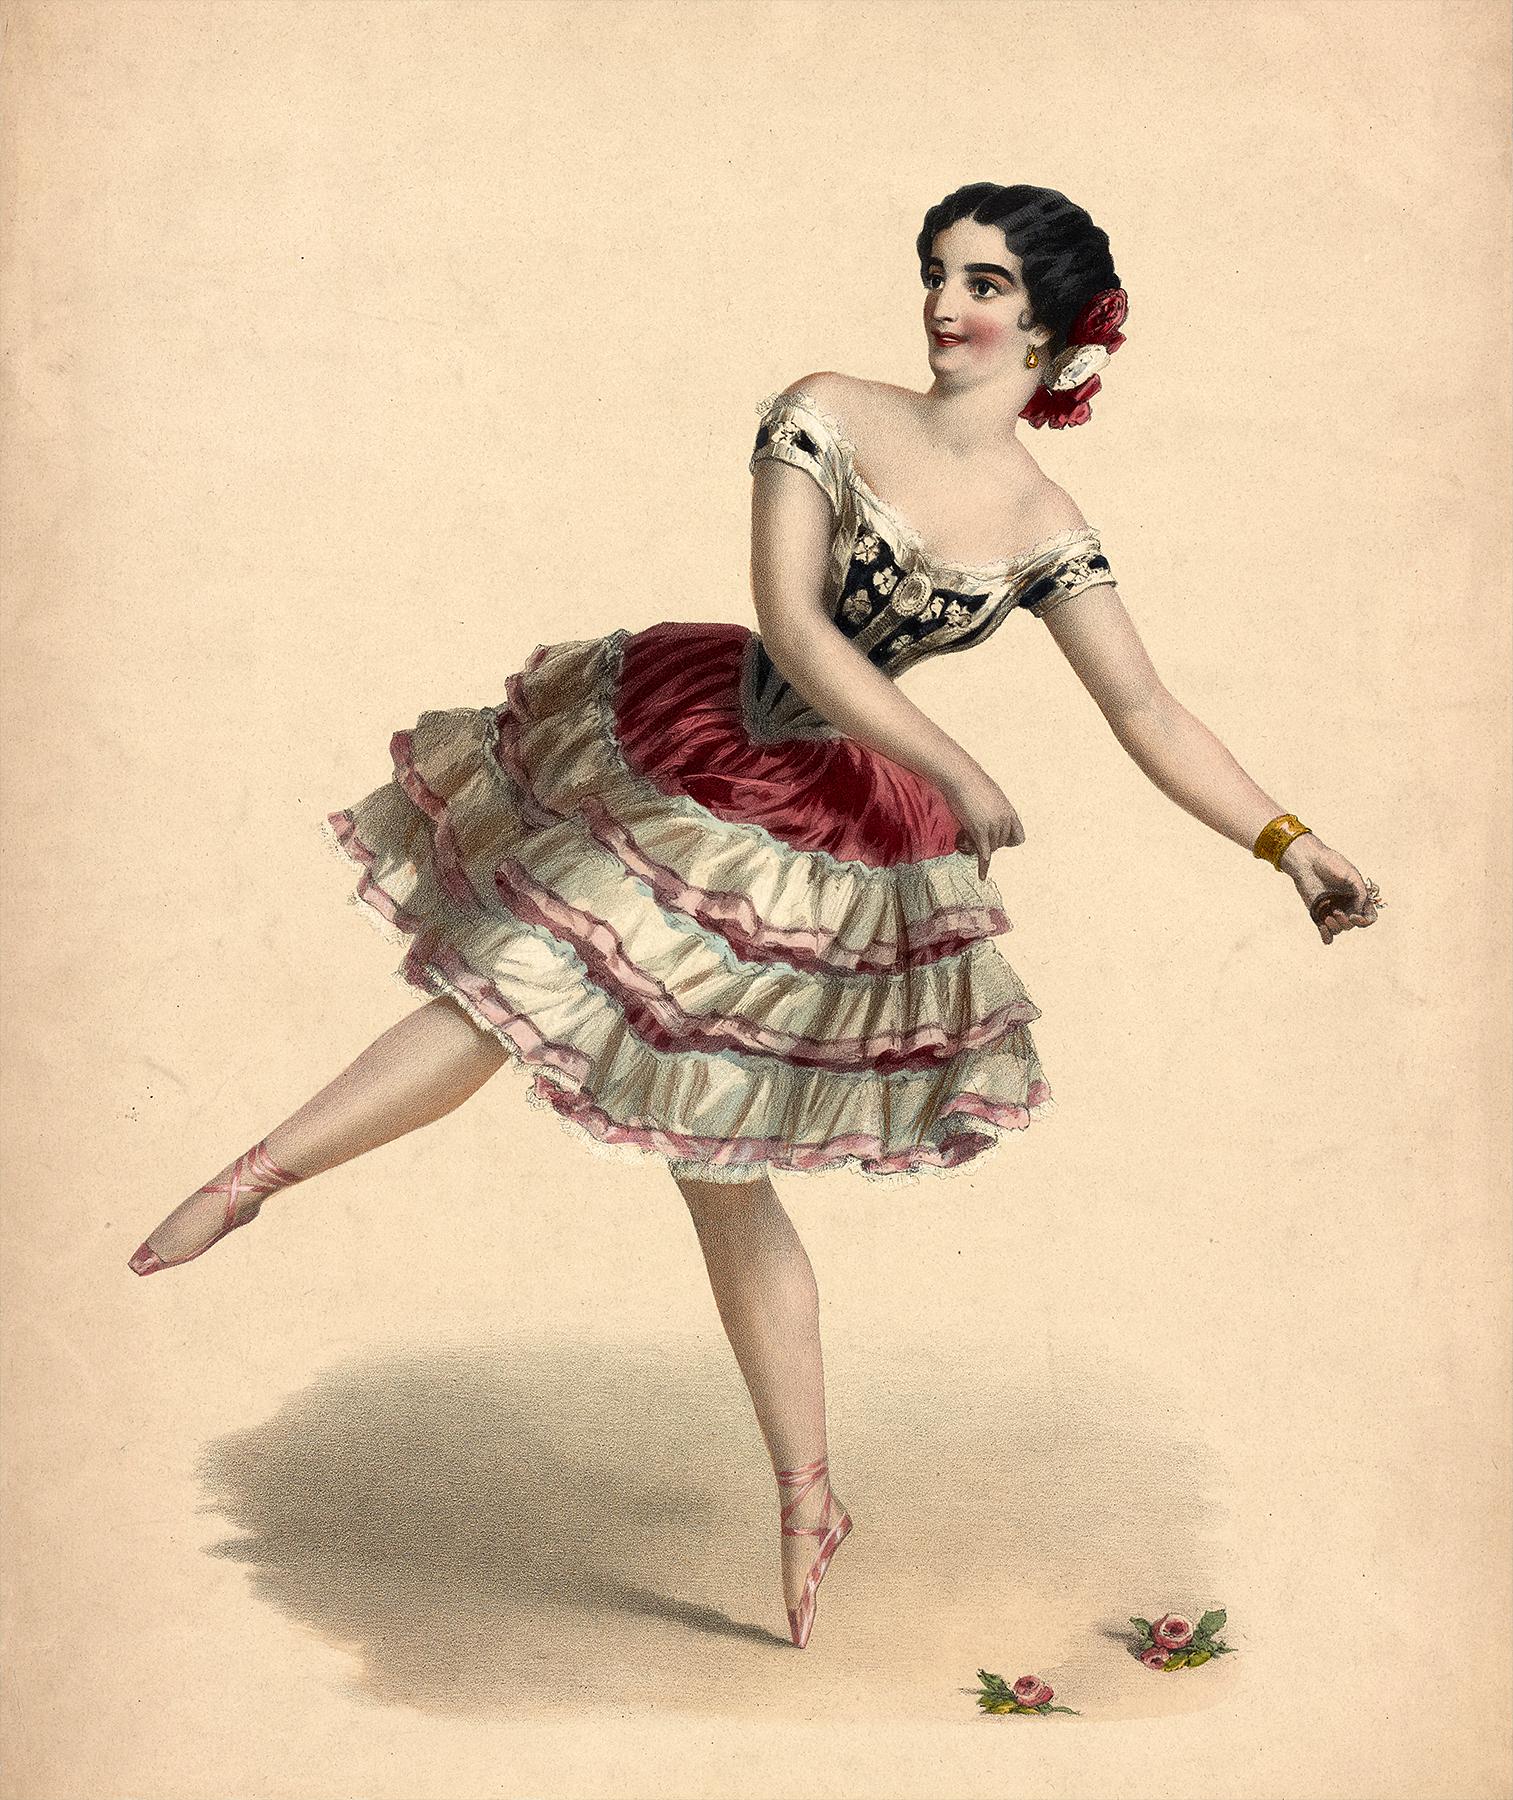 стоит картинки для декупажа балерины винтаж этом году